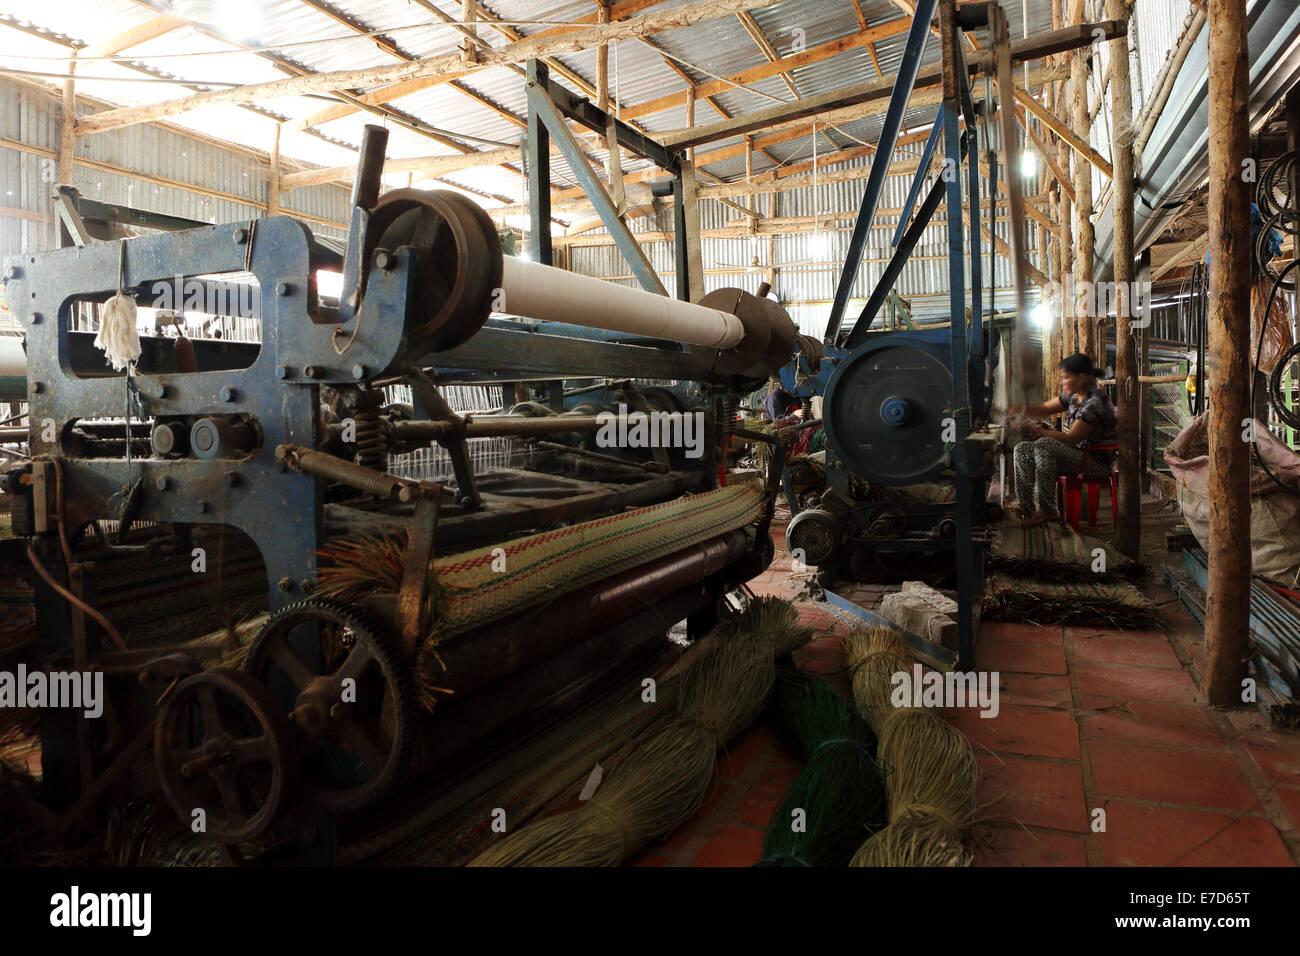 A sedge weaving factory at Tan Chau, Vietnam. - Stock Image